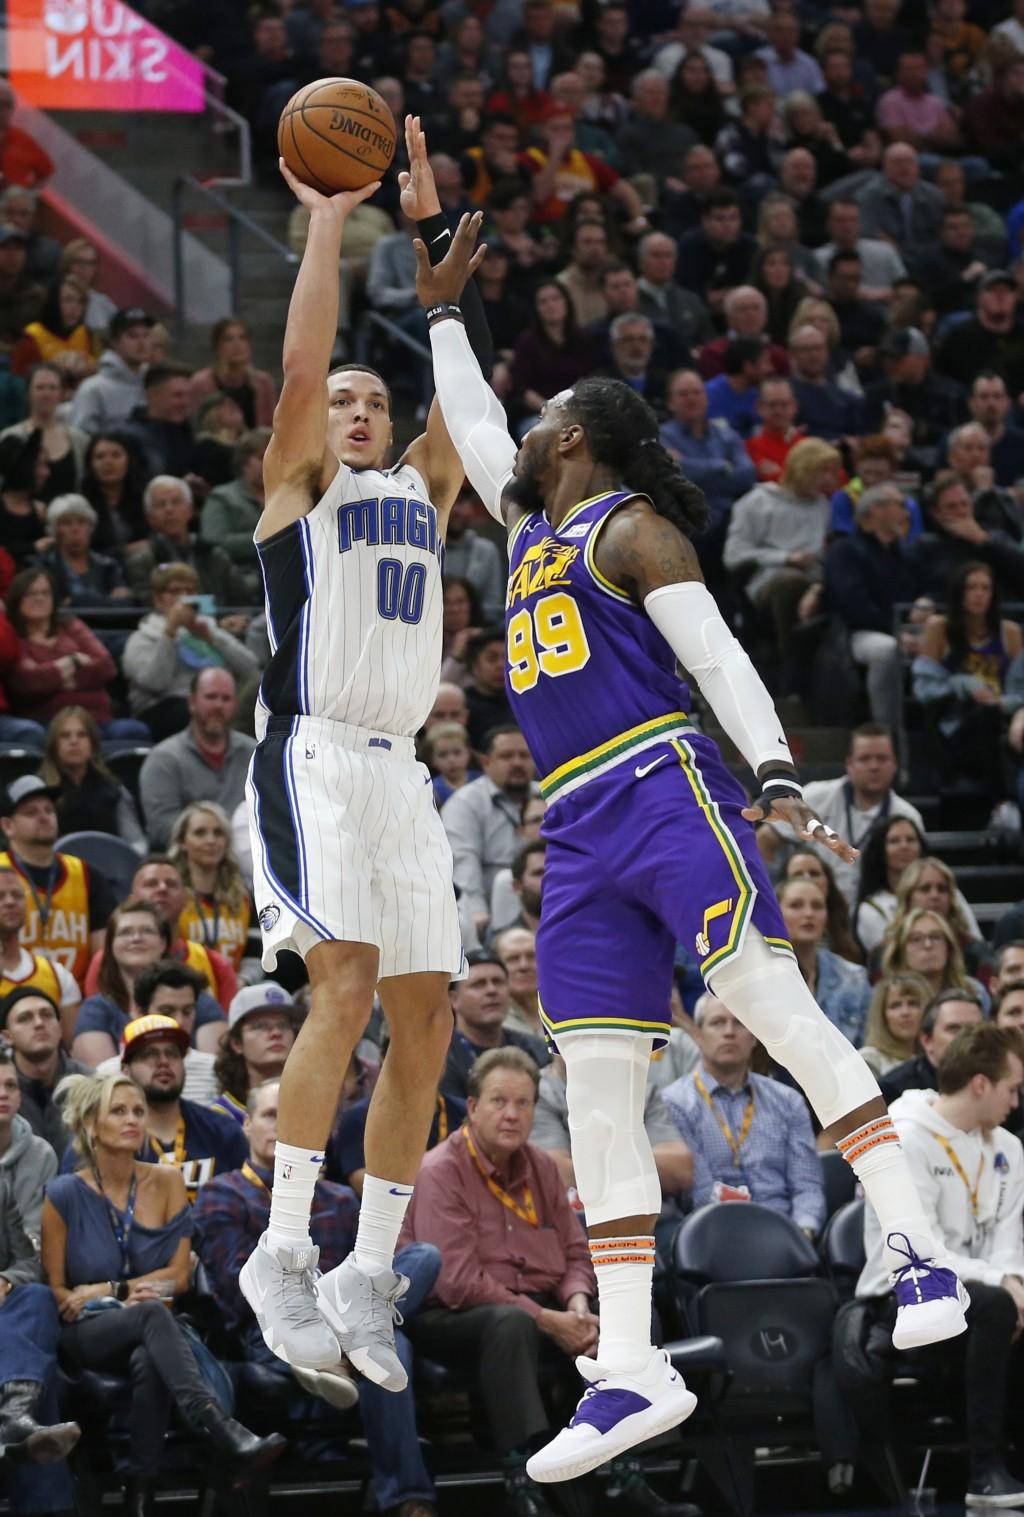 Orlando Magic forward Aaron Gordon (00) shoots as Utah Jazz forward Jae Crowder (99) defends during the first half of an NBA basketball game Wednesday...